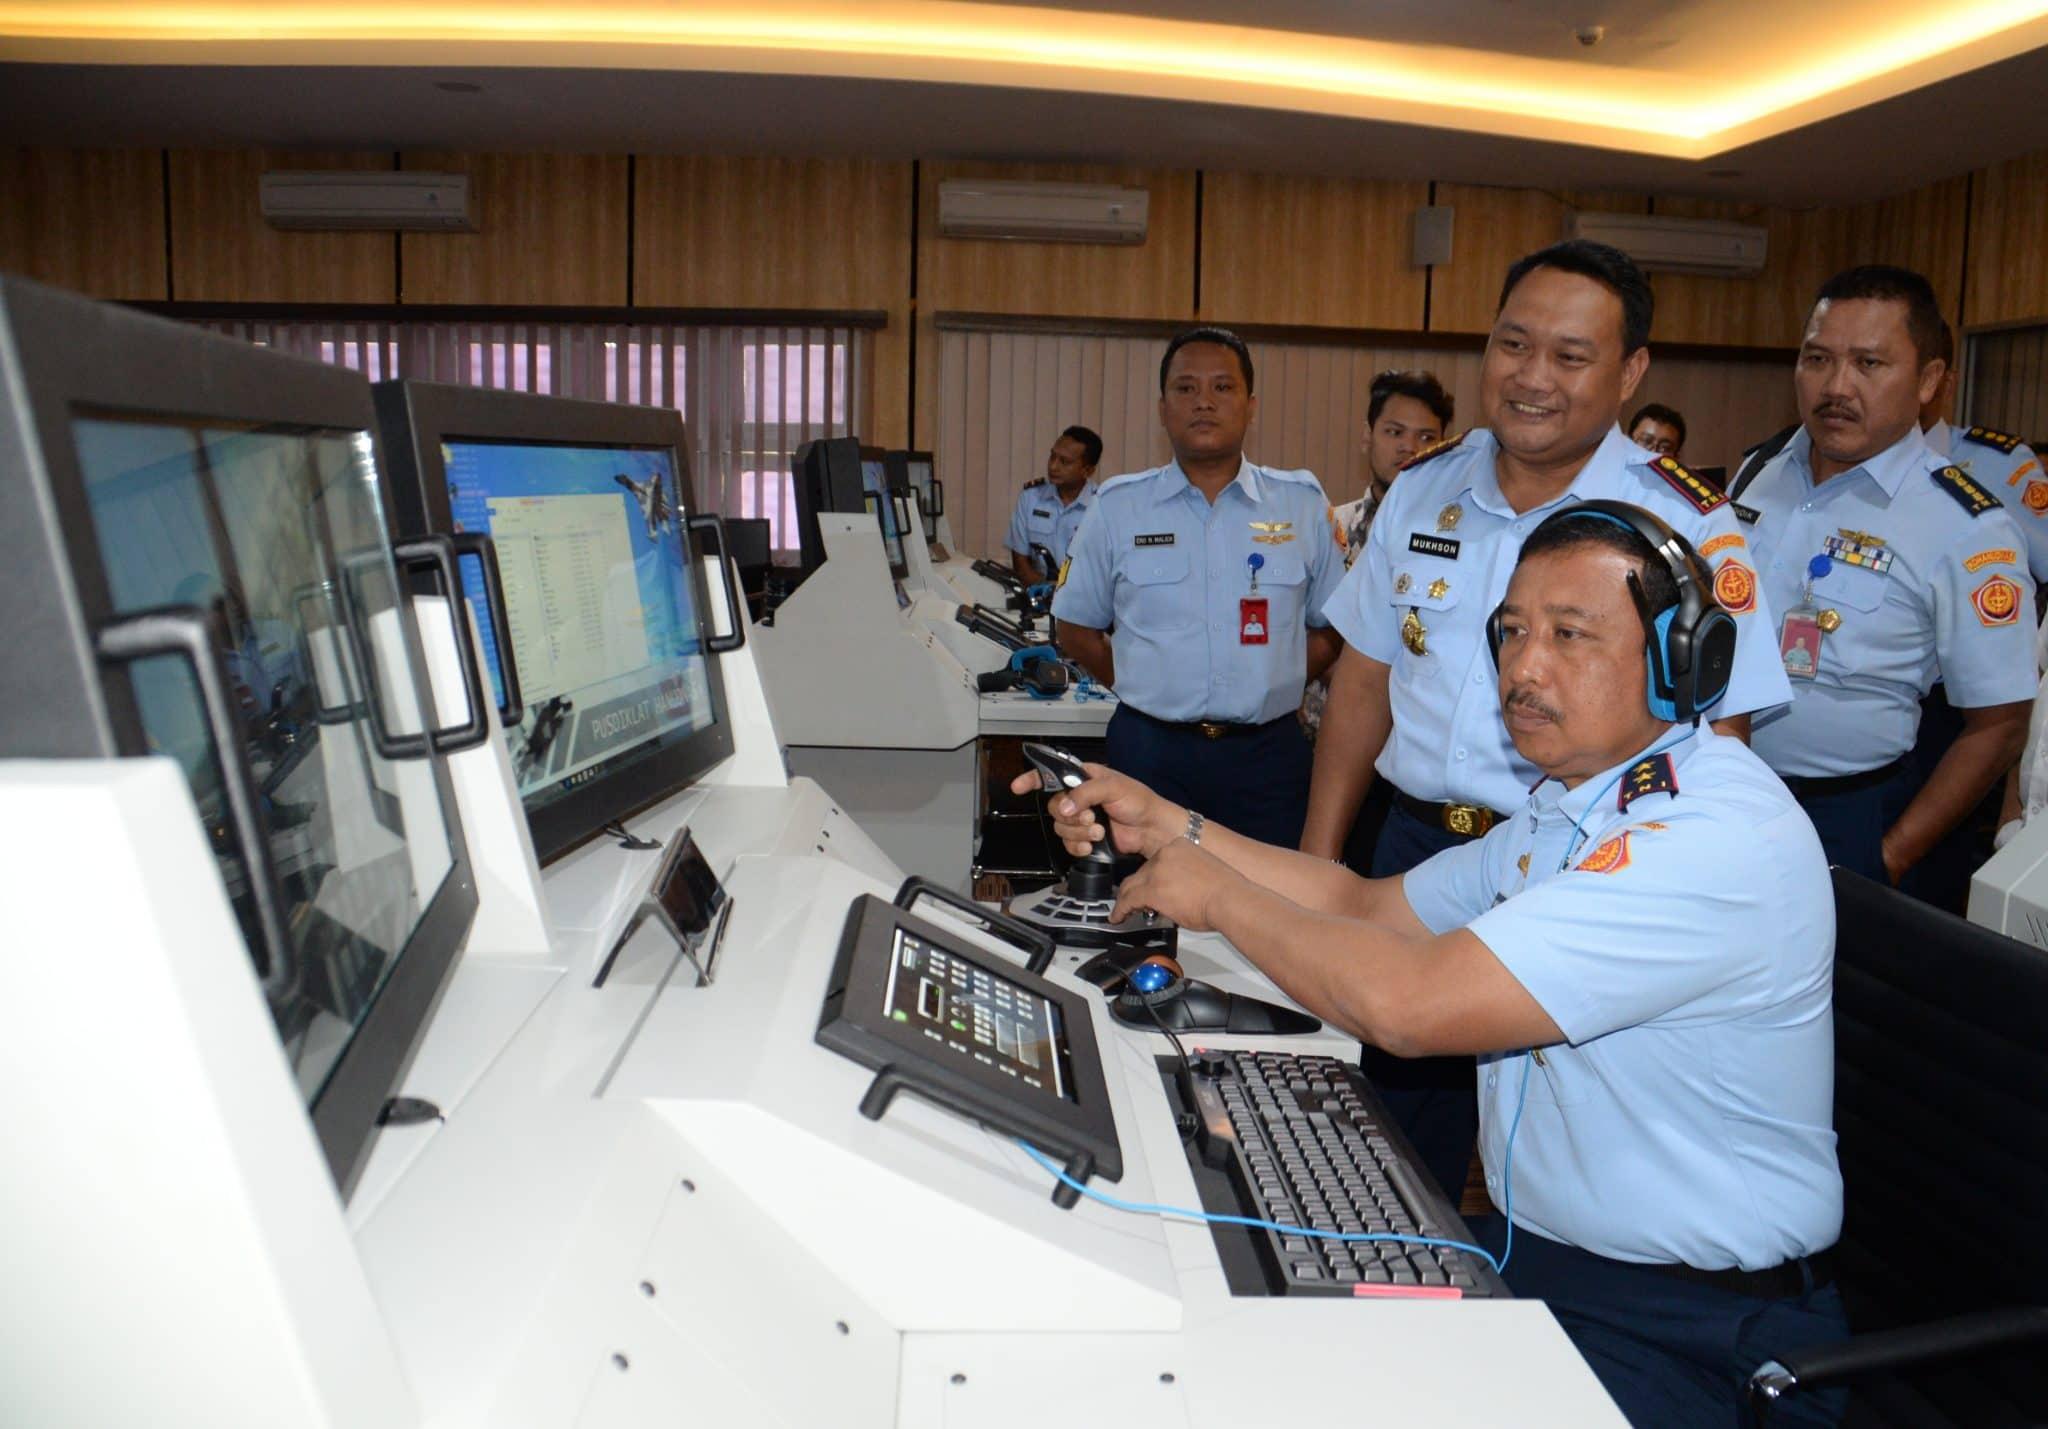 Panglima Kohanudnas Kunjungi Pusdiklathanudnas Surabaya